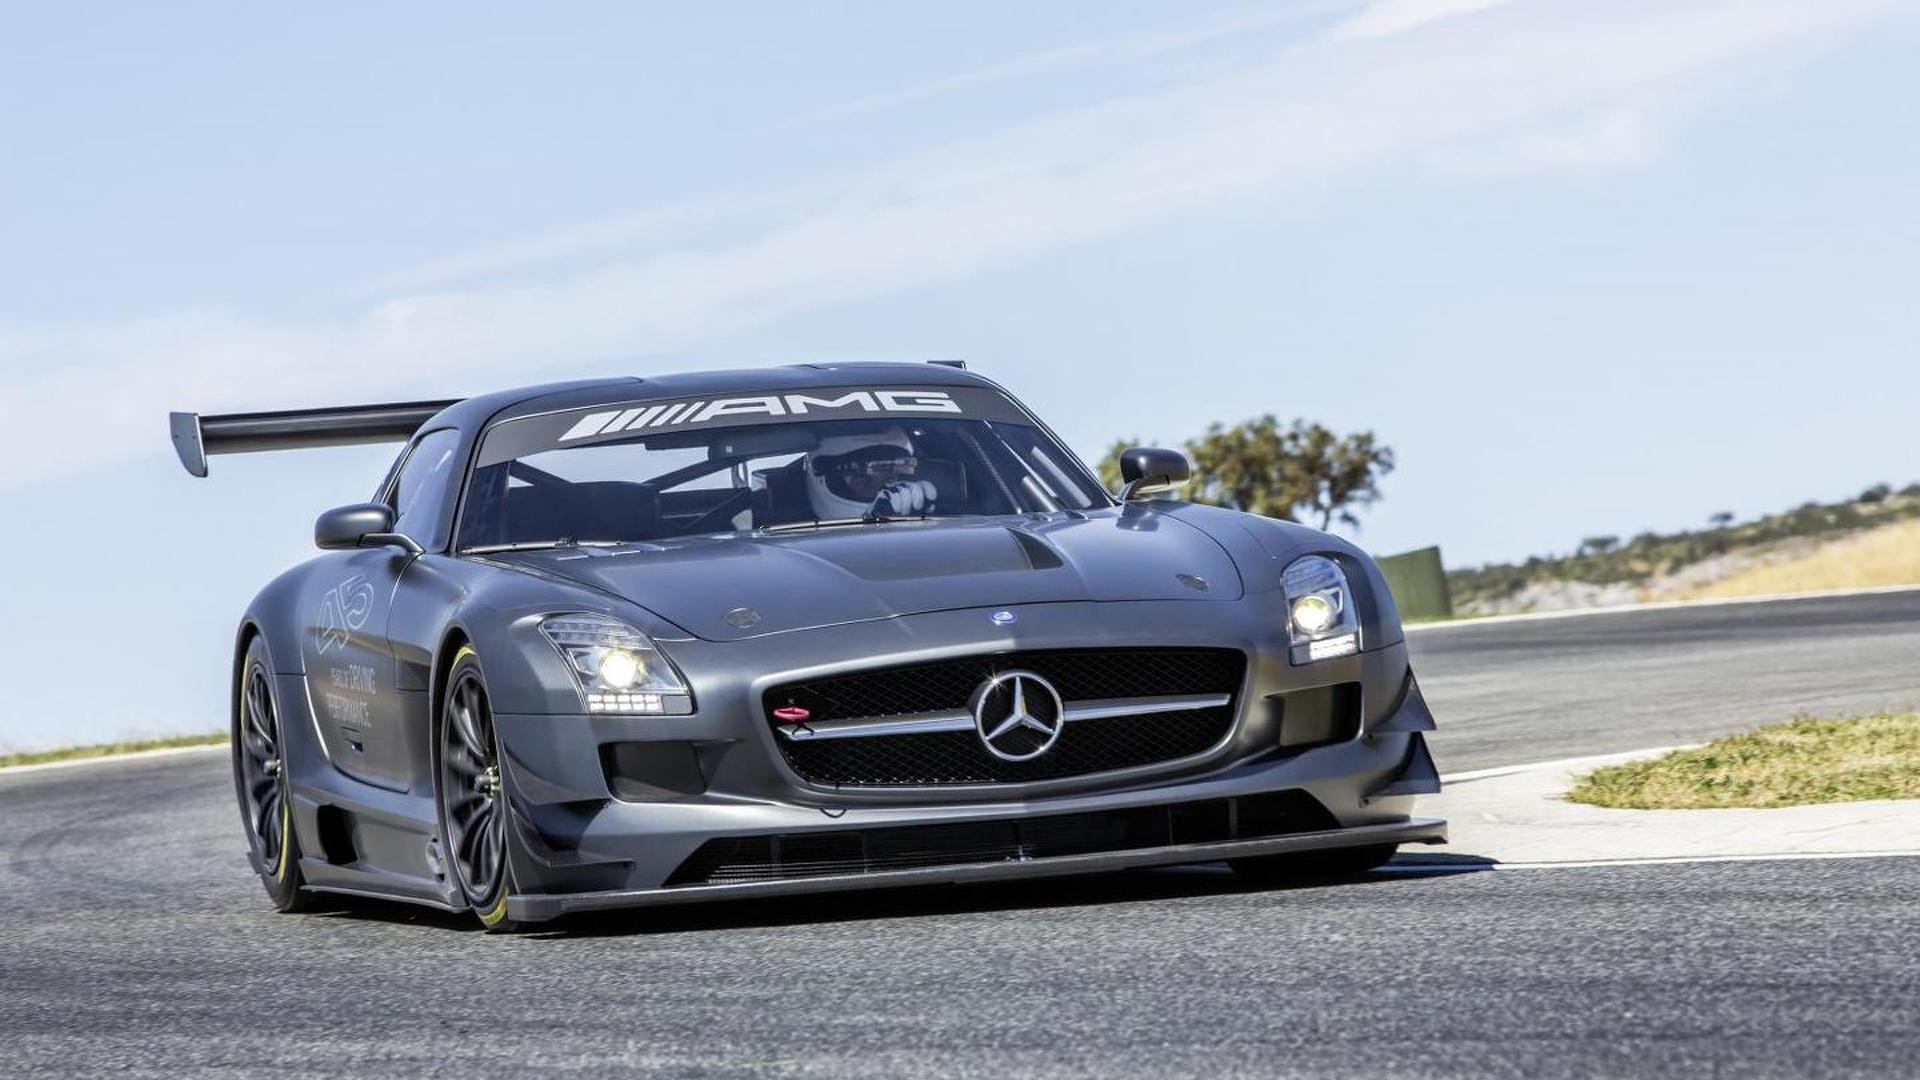 Mercedes-Benz SLS AMG Black Series to get 630 HP